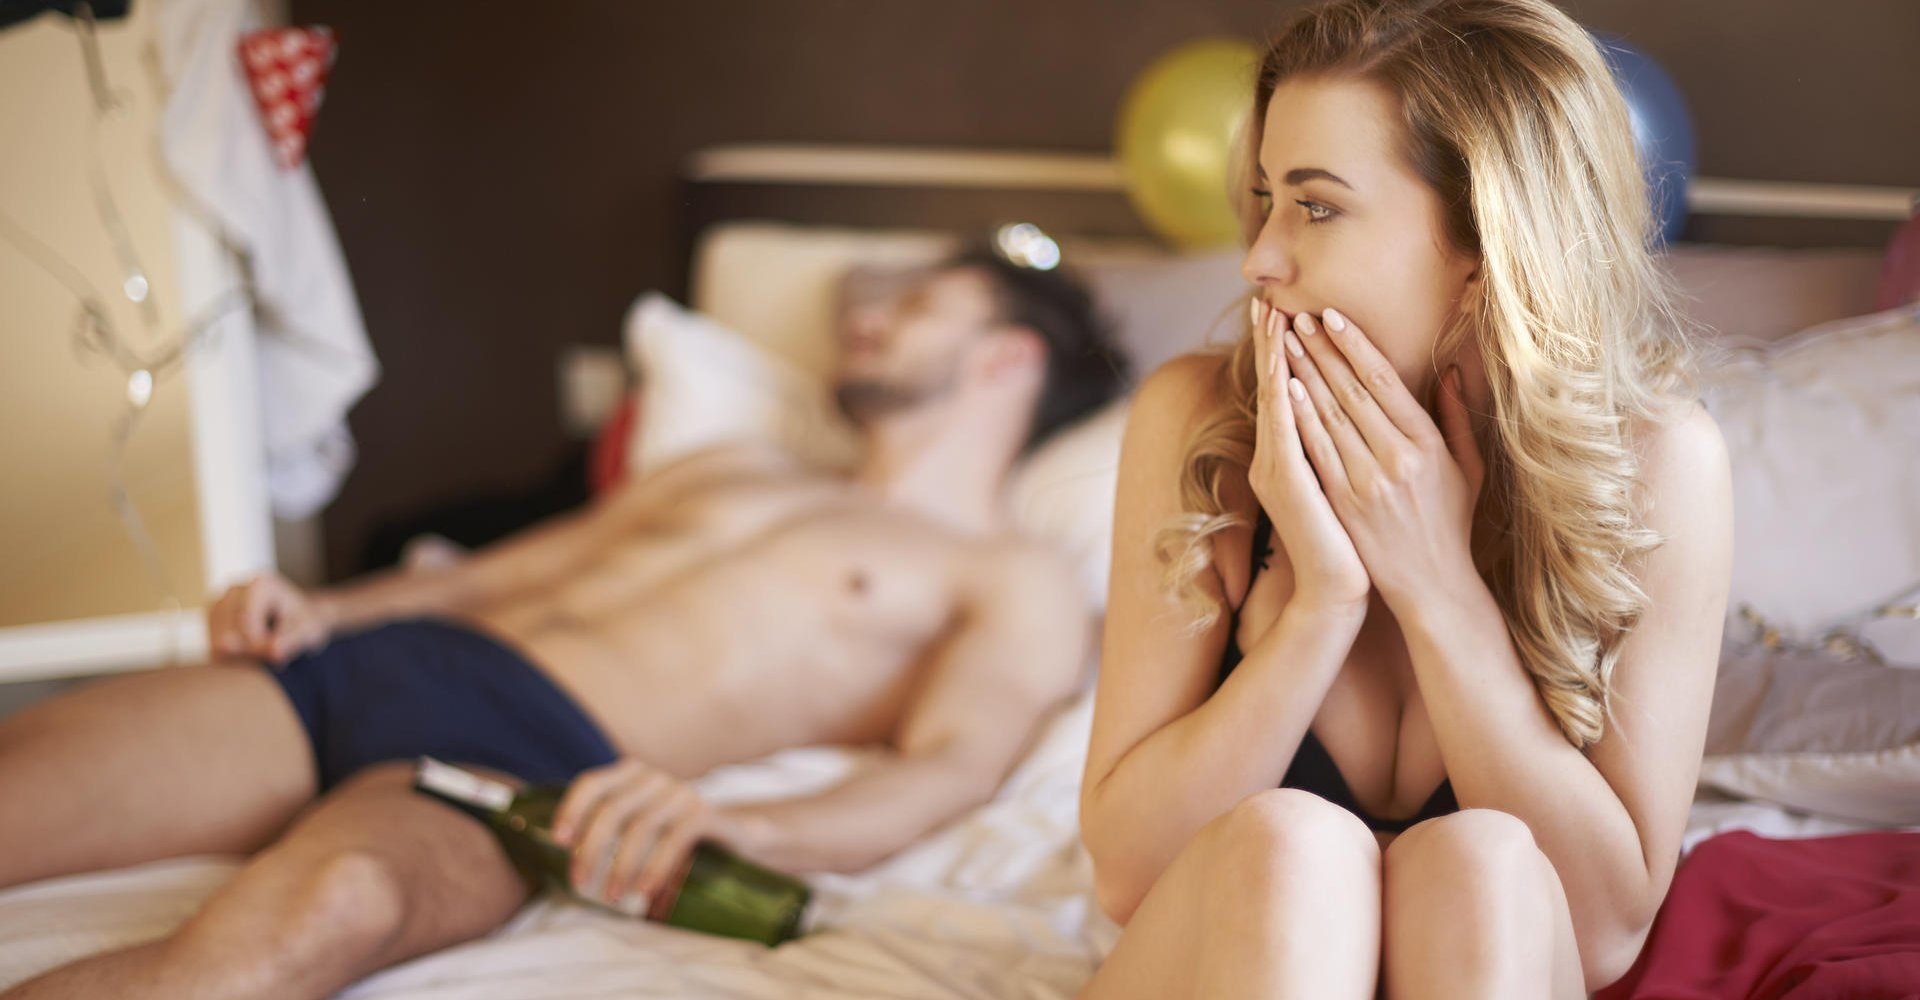 Романи про секс, Порно 18 фотография